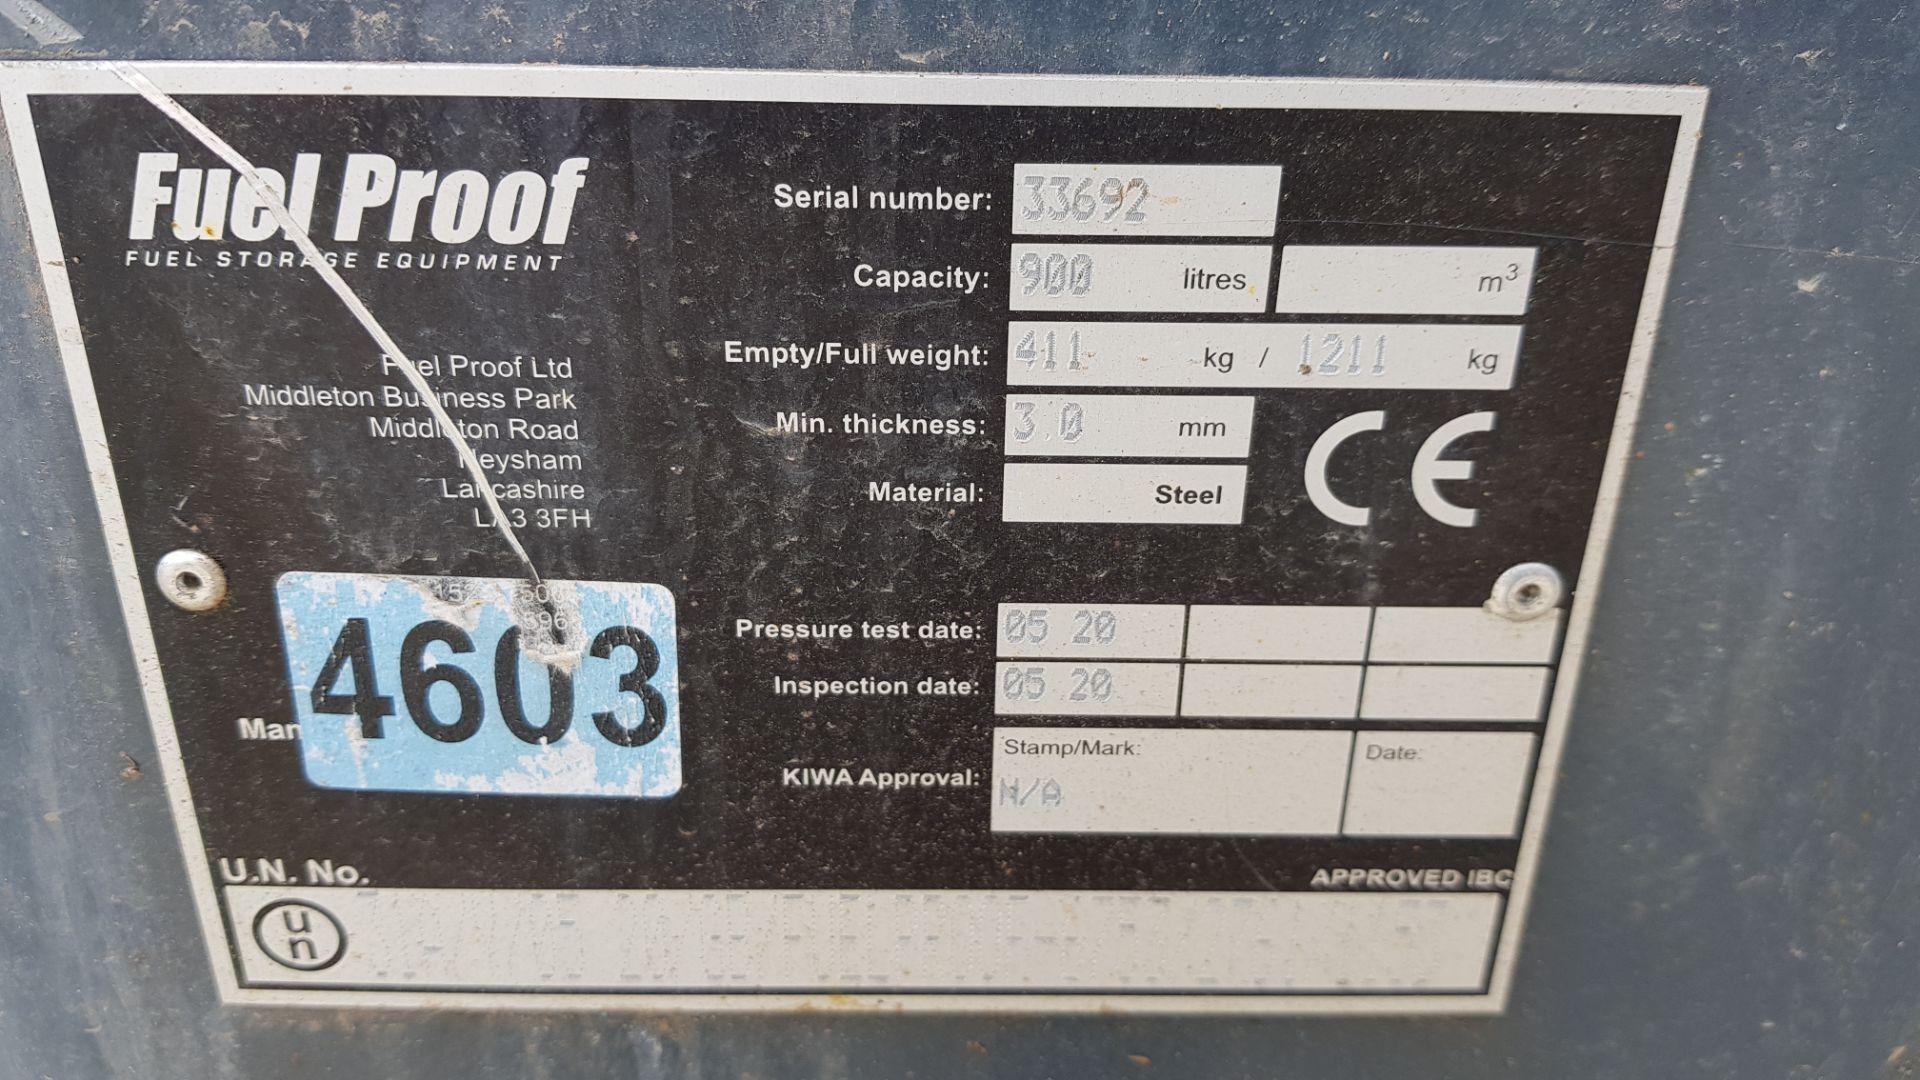 1 X (FUEL PROOF) 900 CUBE FUEL DISPENSER 900 LITRE CAPACITY SERIAL NUMBER - 33692 24V DIESEL PUMP - Image 2 of 3